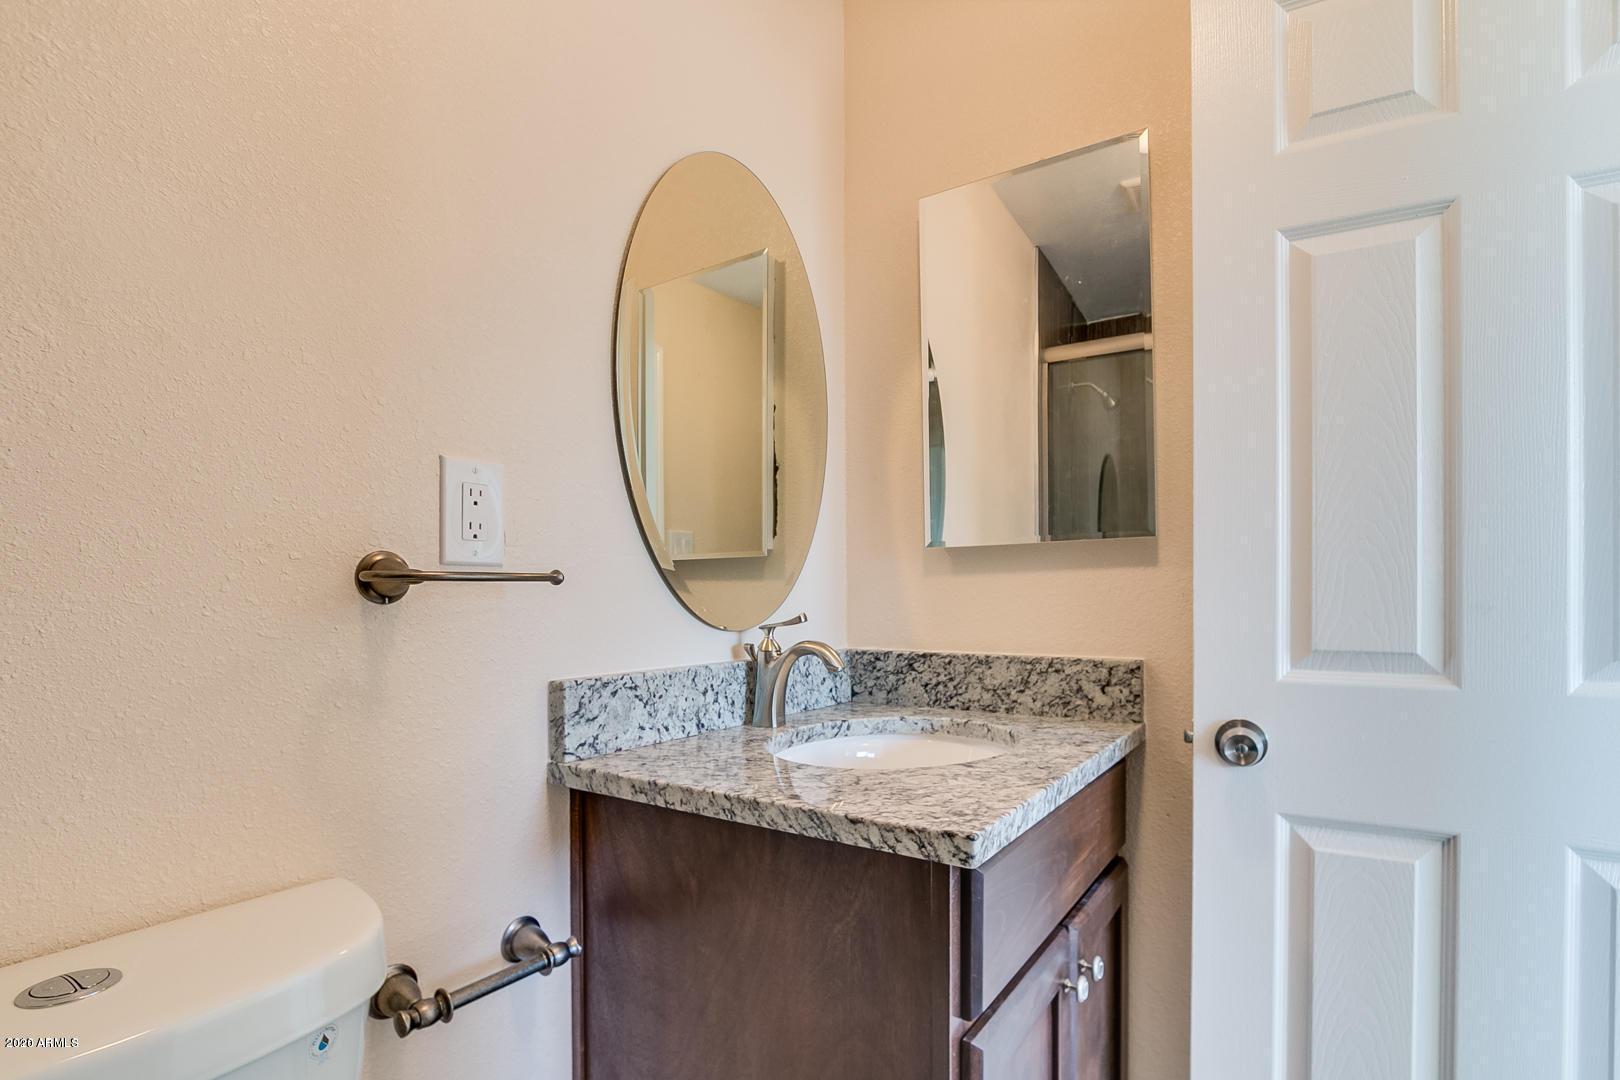 18927 W PORTLAND Street, Buckeye, Arizona 85326, 3 Bedrooms Bedrooms, ,Residential,For Sale,18927 W PORTLAND Street,6034901